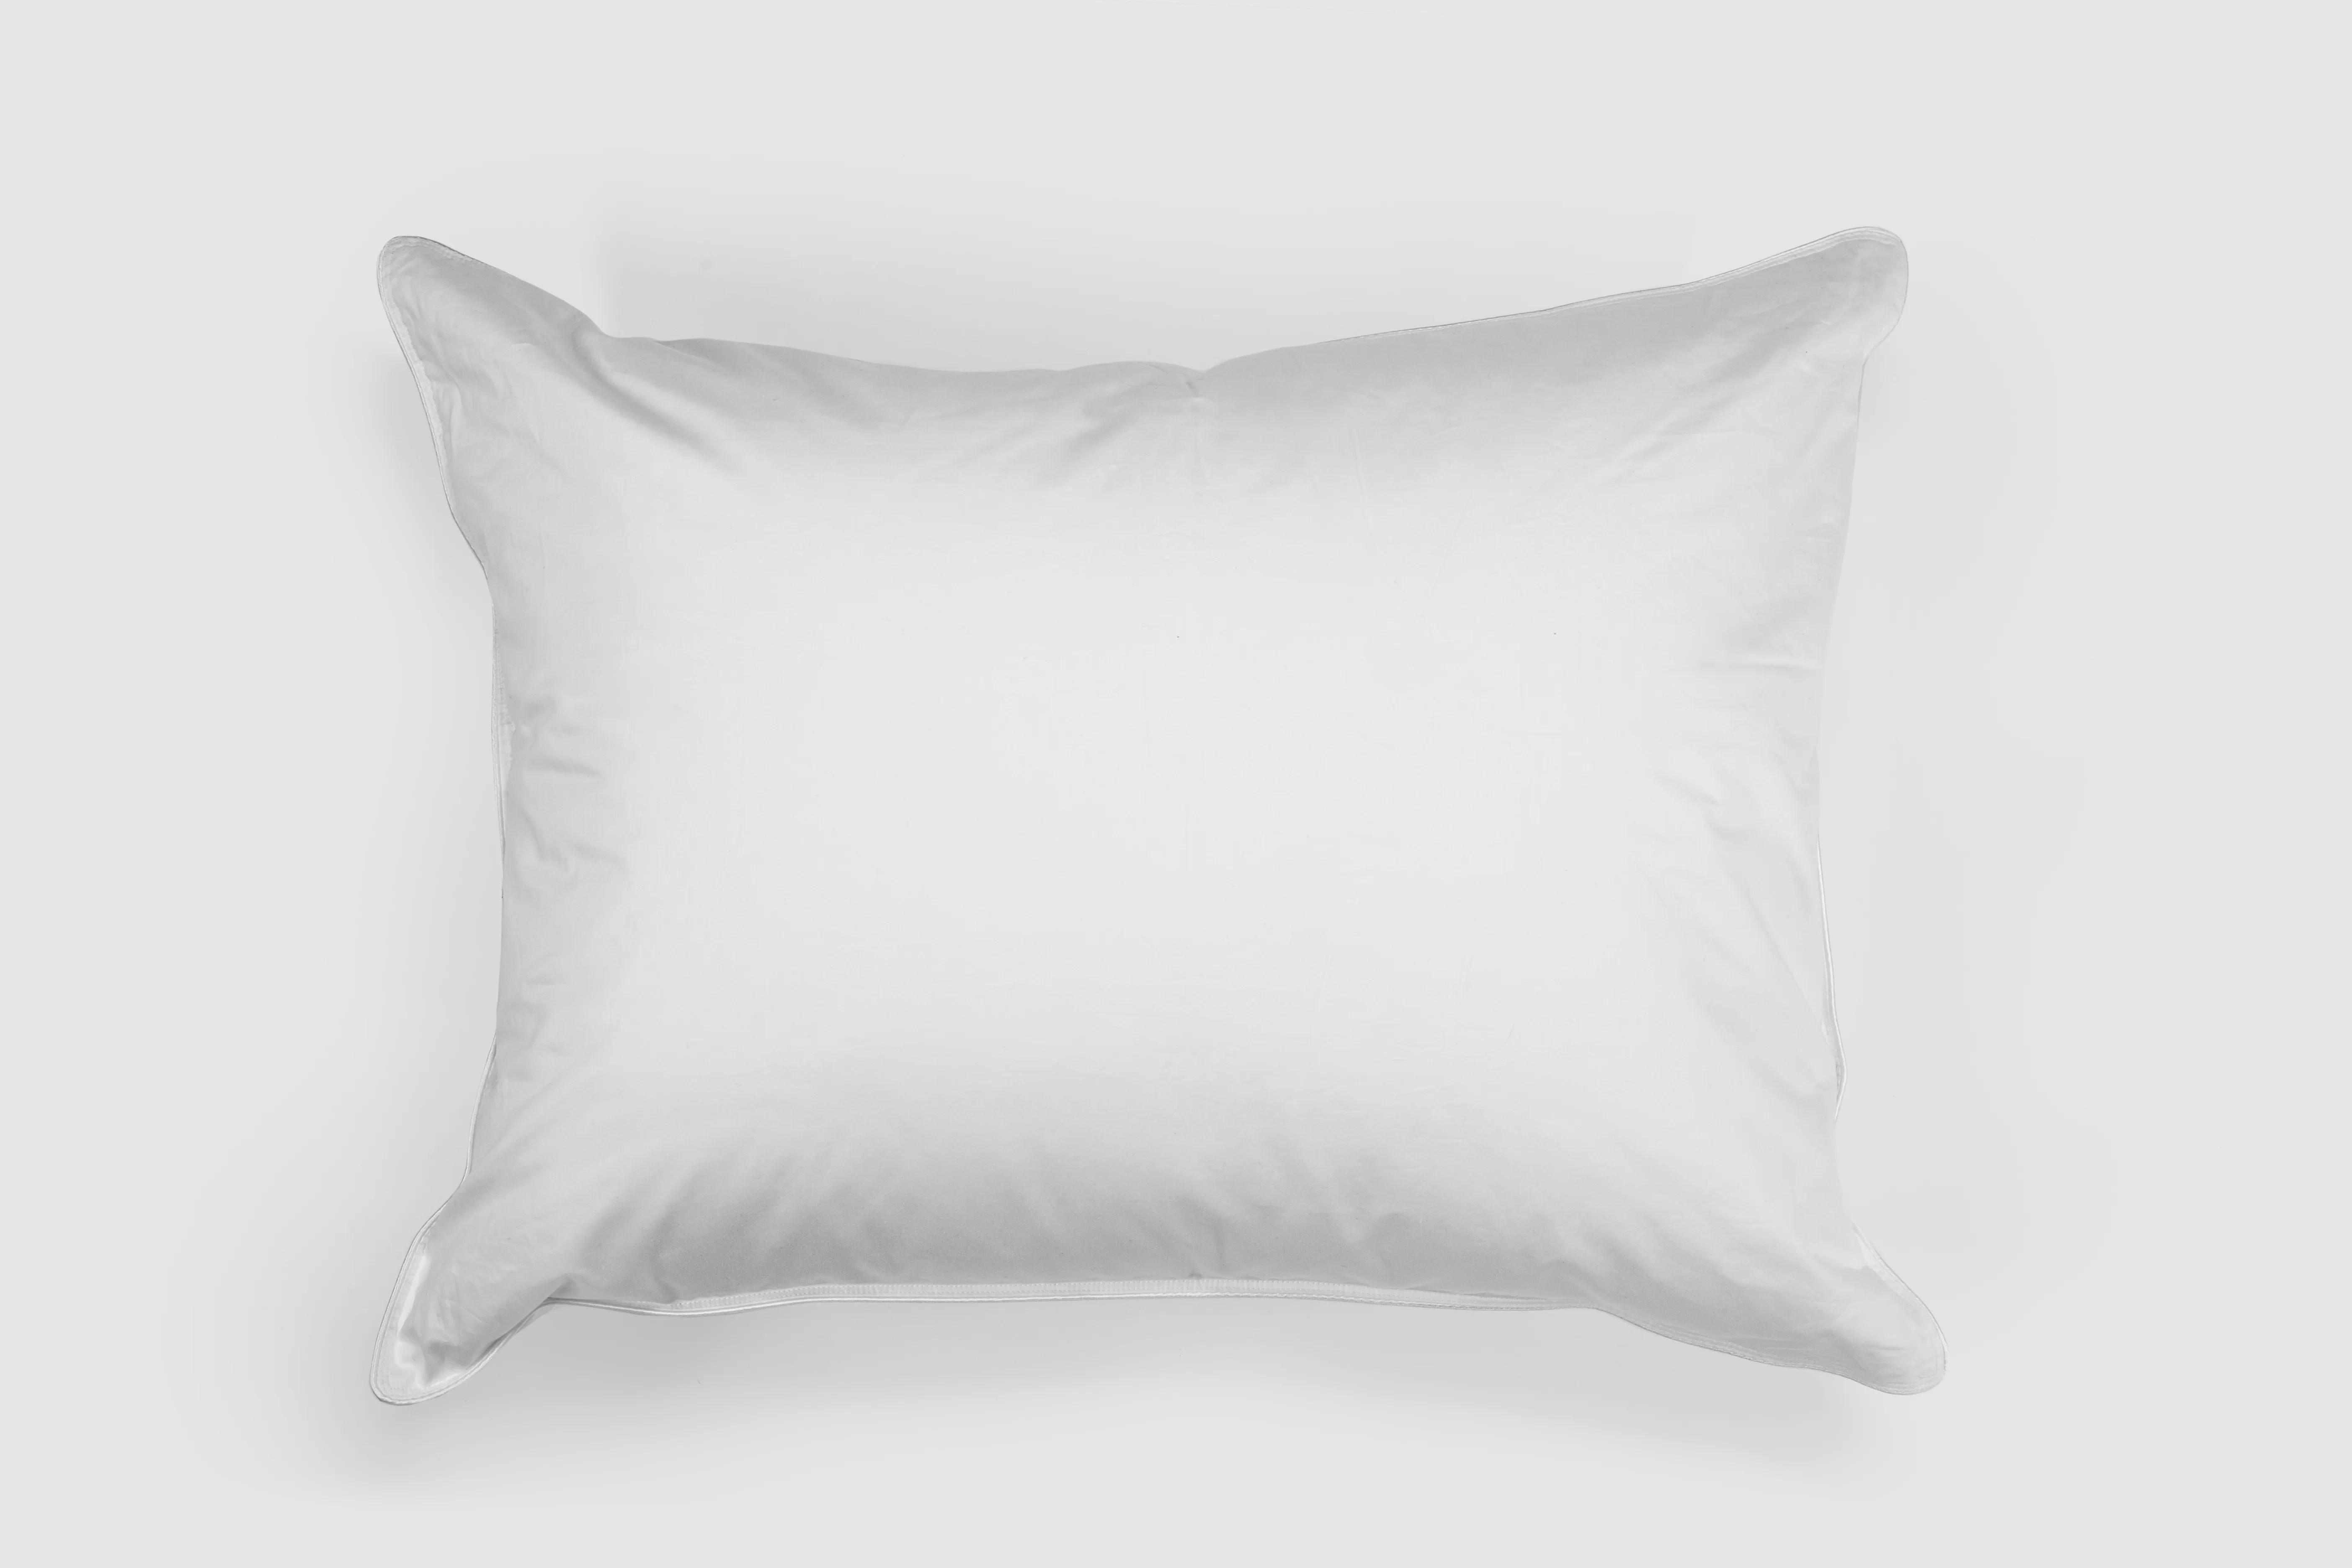 arsuite soft down pillow wayfair